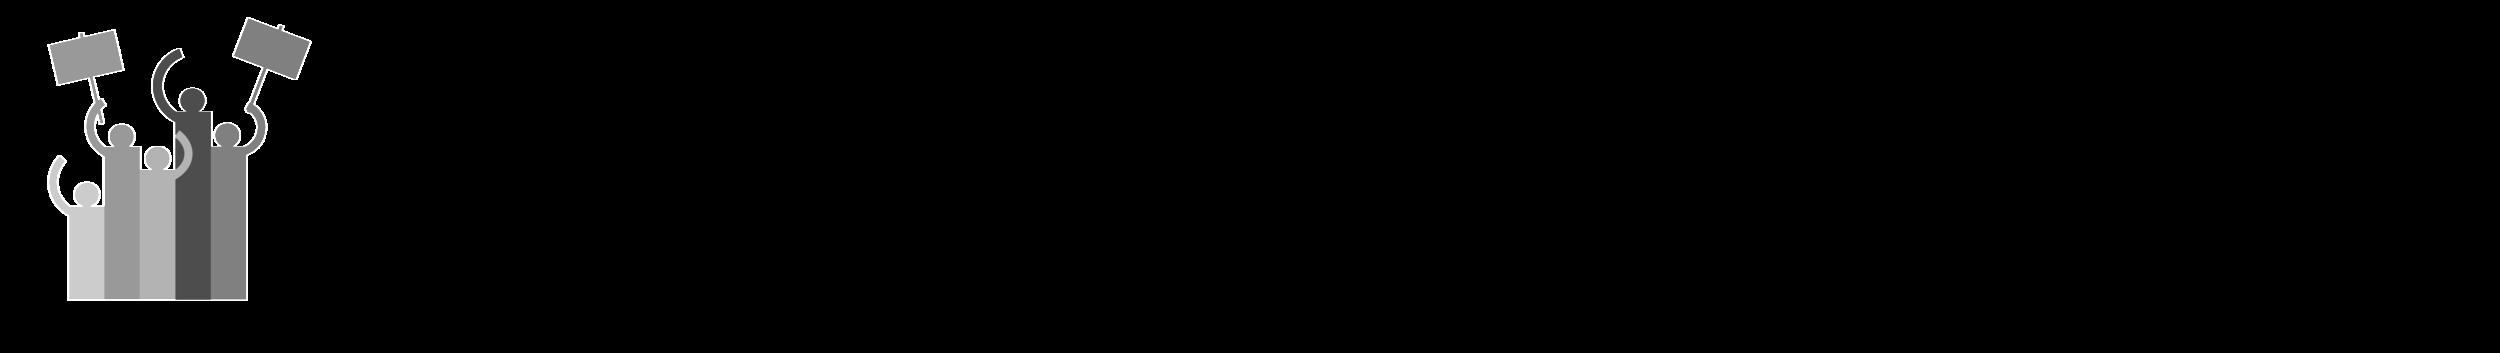 Data for politics logo long-01.png